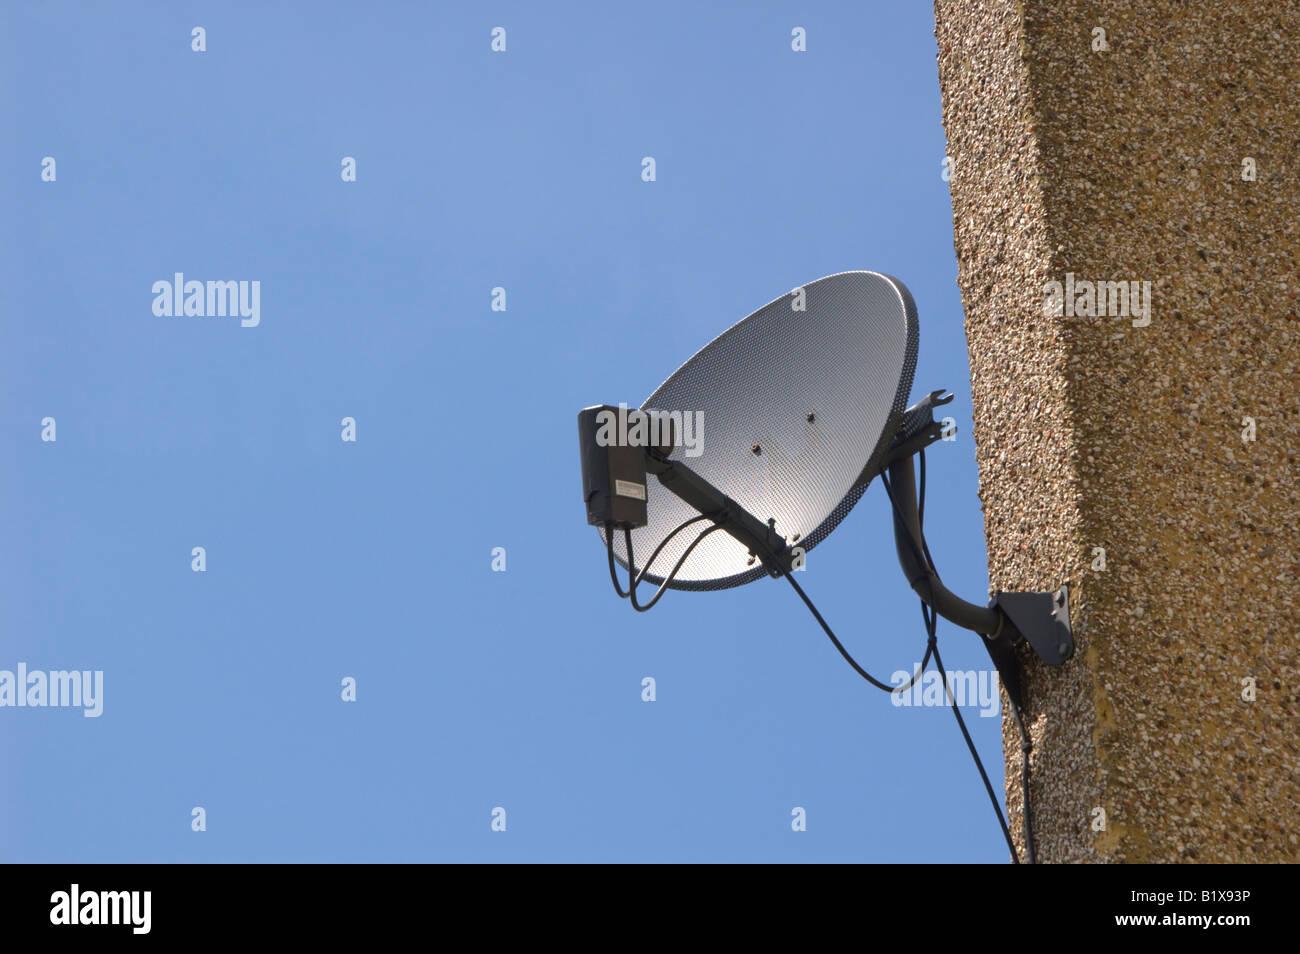 Satellite dish 1/2 - Stock Image